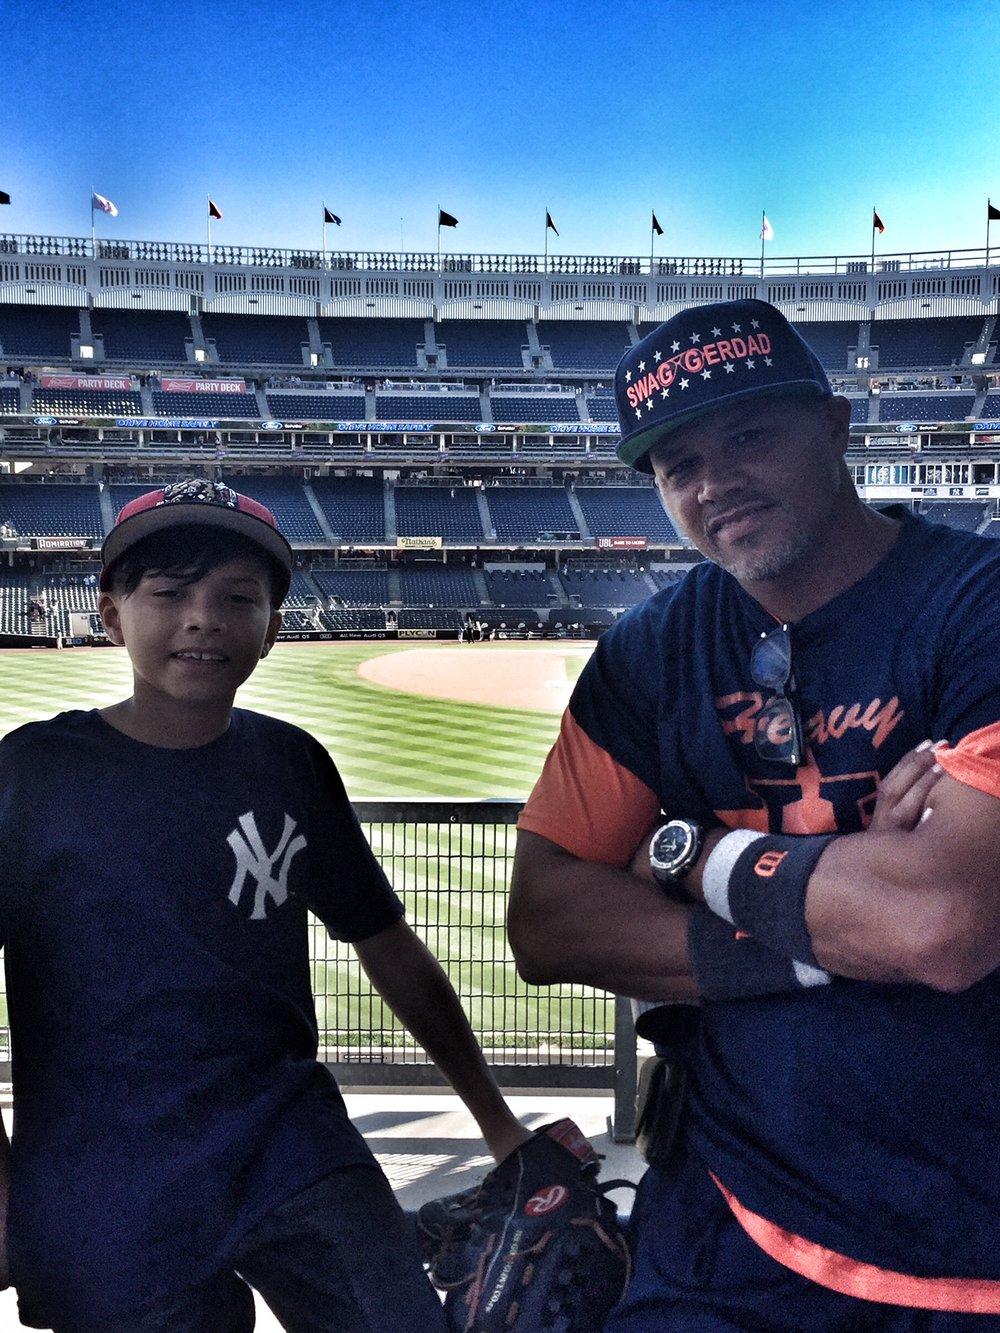 My son and I at Yankees Staduim